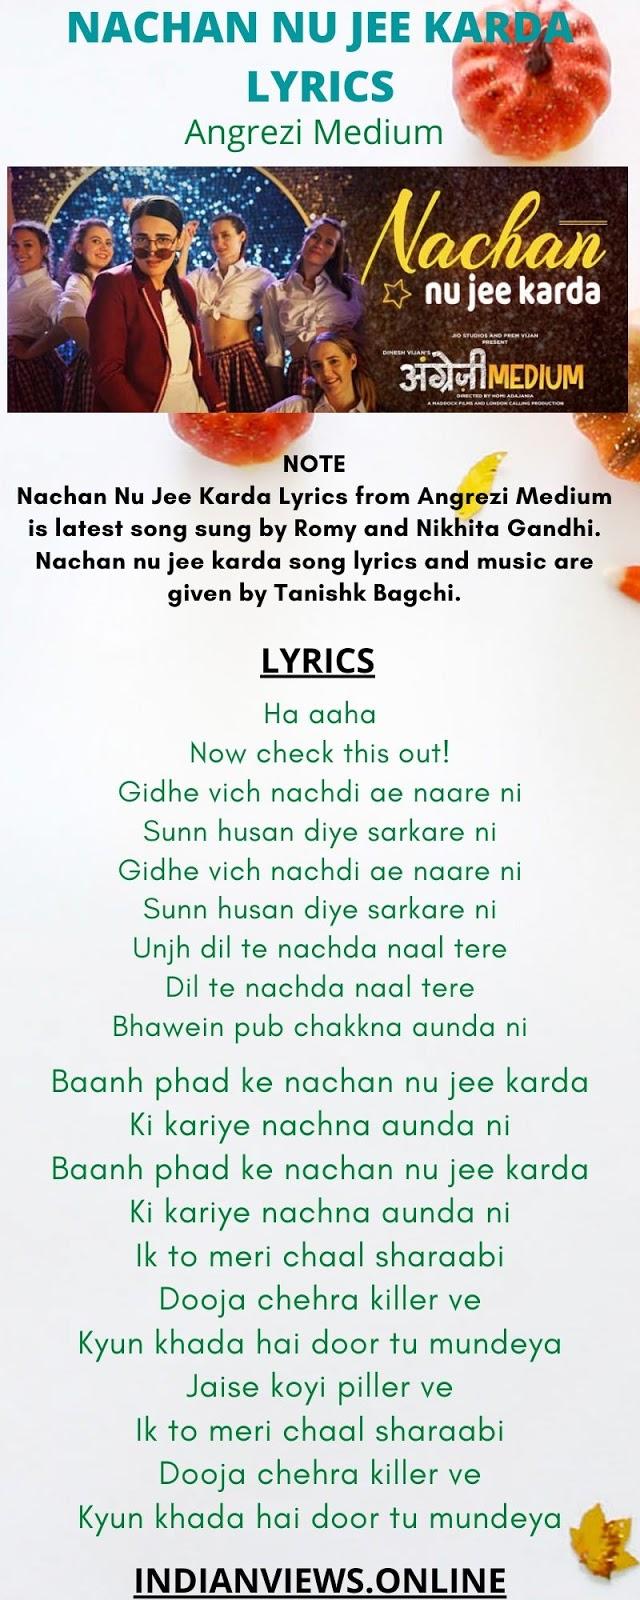 NACHAN NU JEE KARDA LYRICS, NACHAN NU JEE KARDA SONG  LYRICS,  Nachan Nu Jee Karda (Angrezi Medium) mp3 song download,  NACHAN NU JEE KARDA LYRICS Angrezi Medium